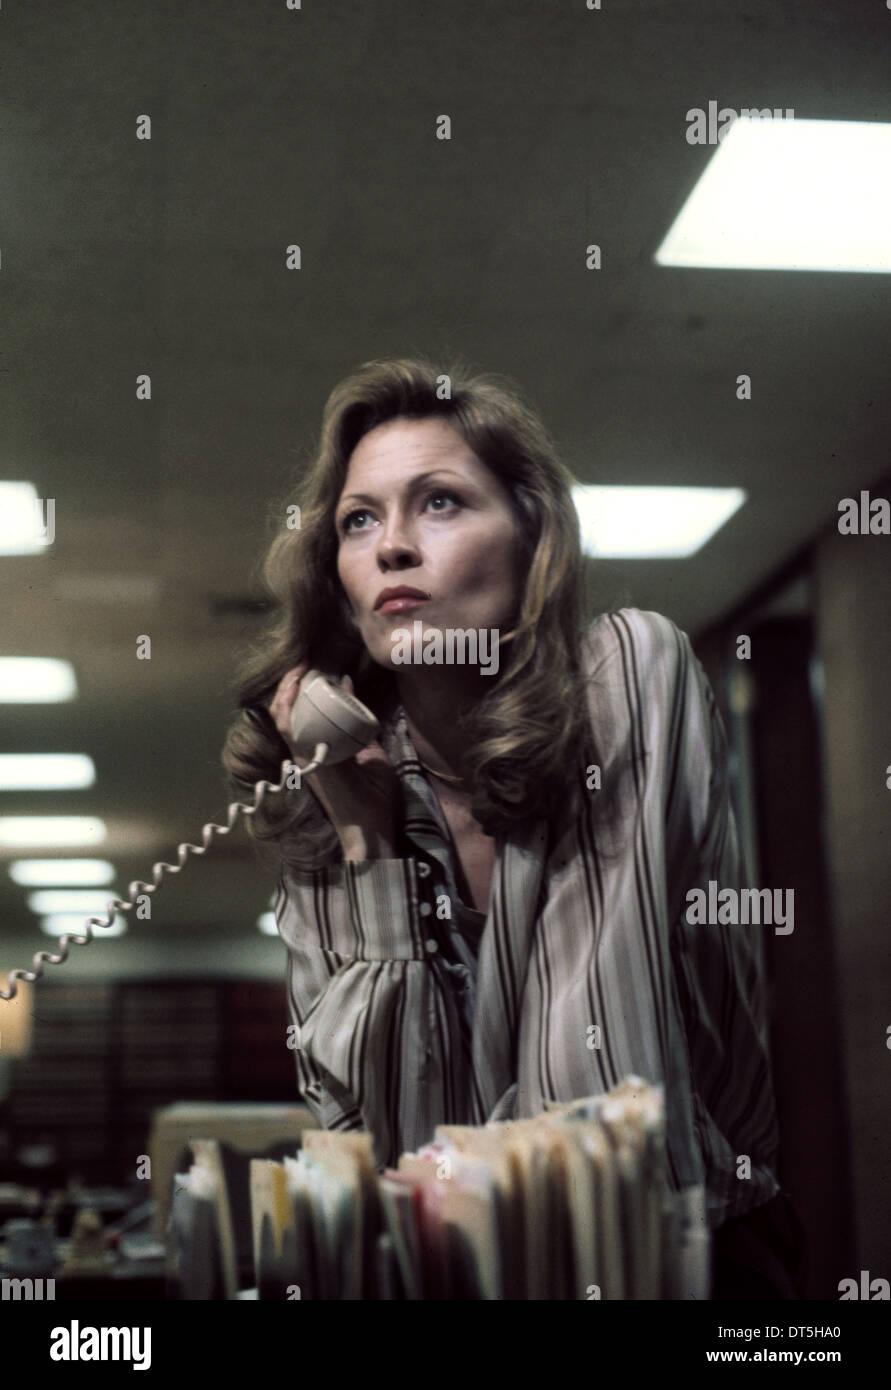 Faye dunaway network - Faye Dunaway Network 1976